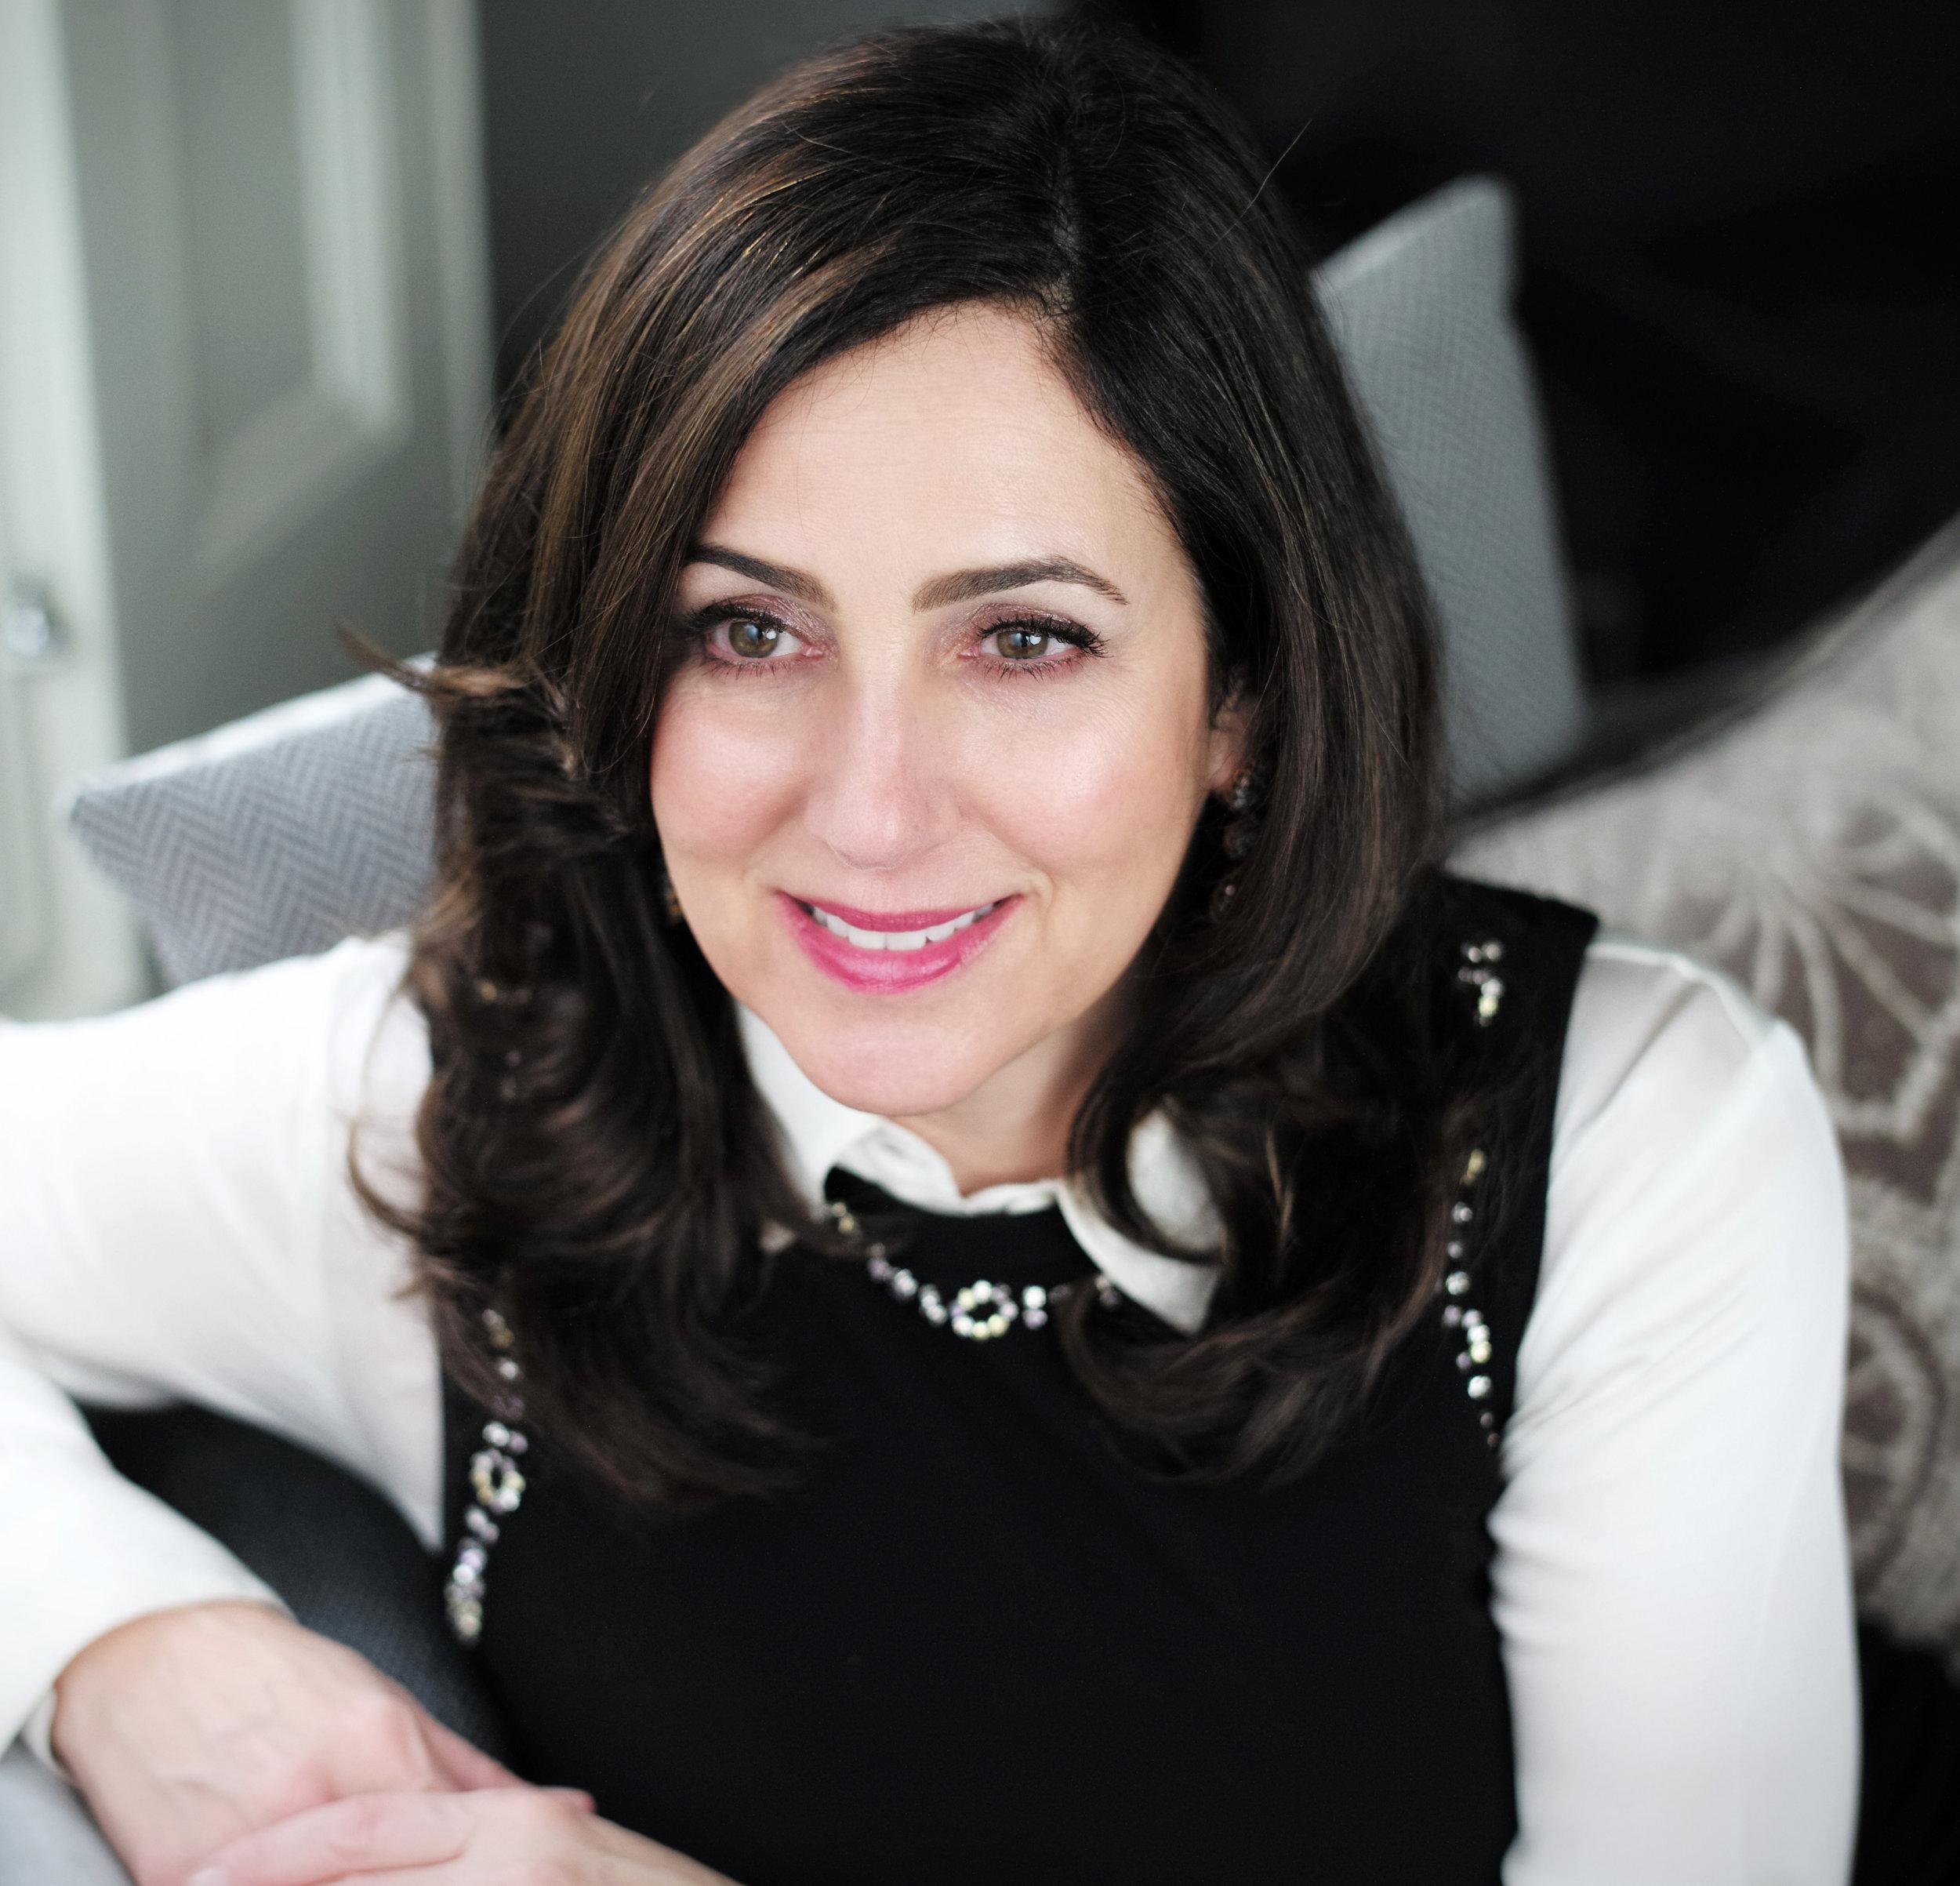 Joanna Shields CEO BenevolentAI at Morgan Stanley Healthcare Conference